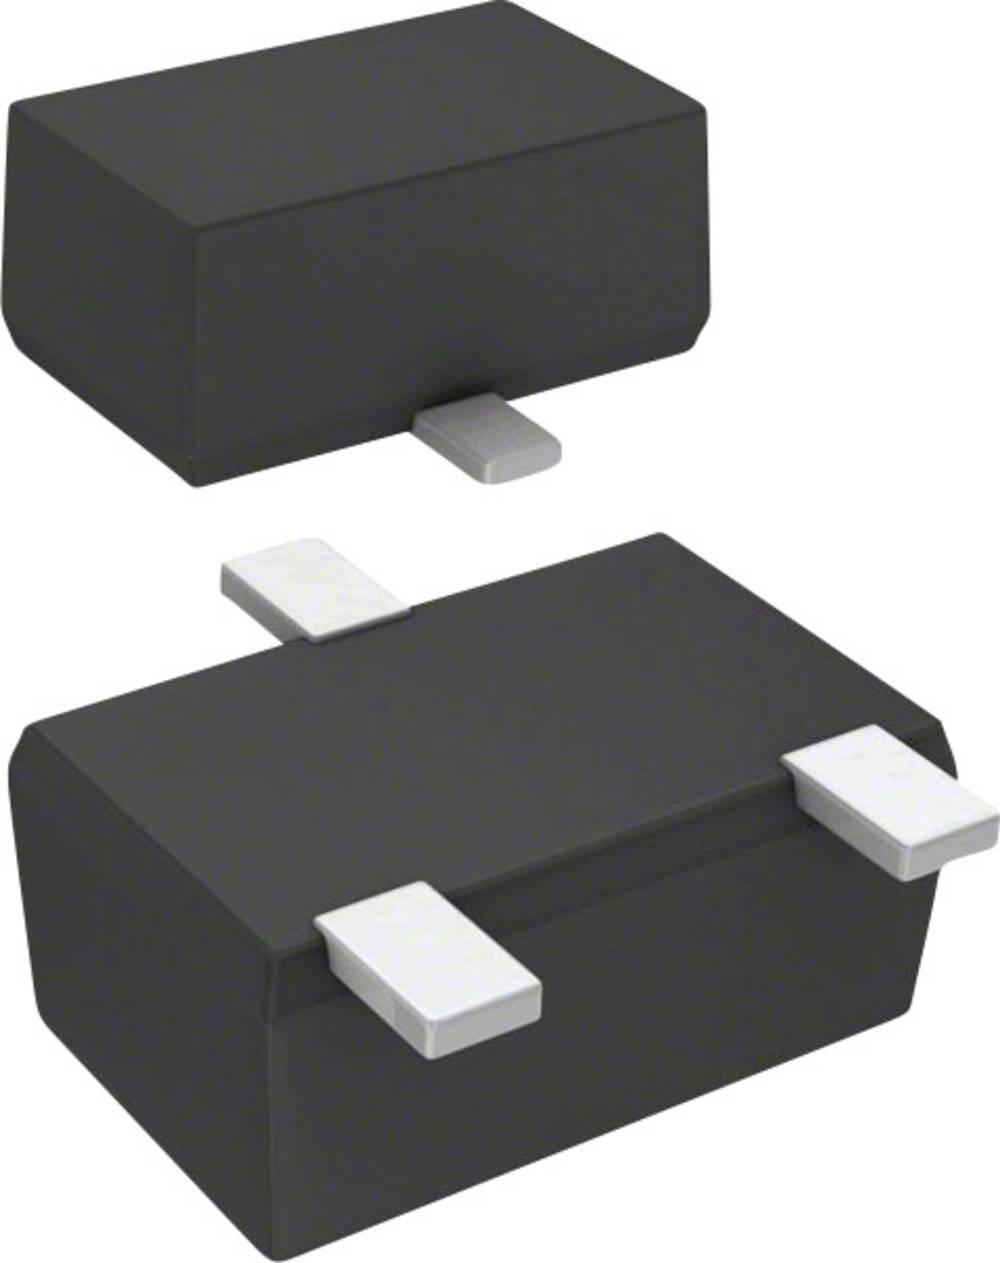 Schottky dioda Panasonic DB3J208K0L vrsta kućišta: SMini3-F2-B